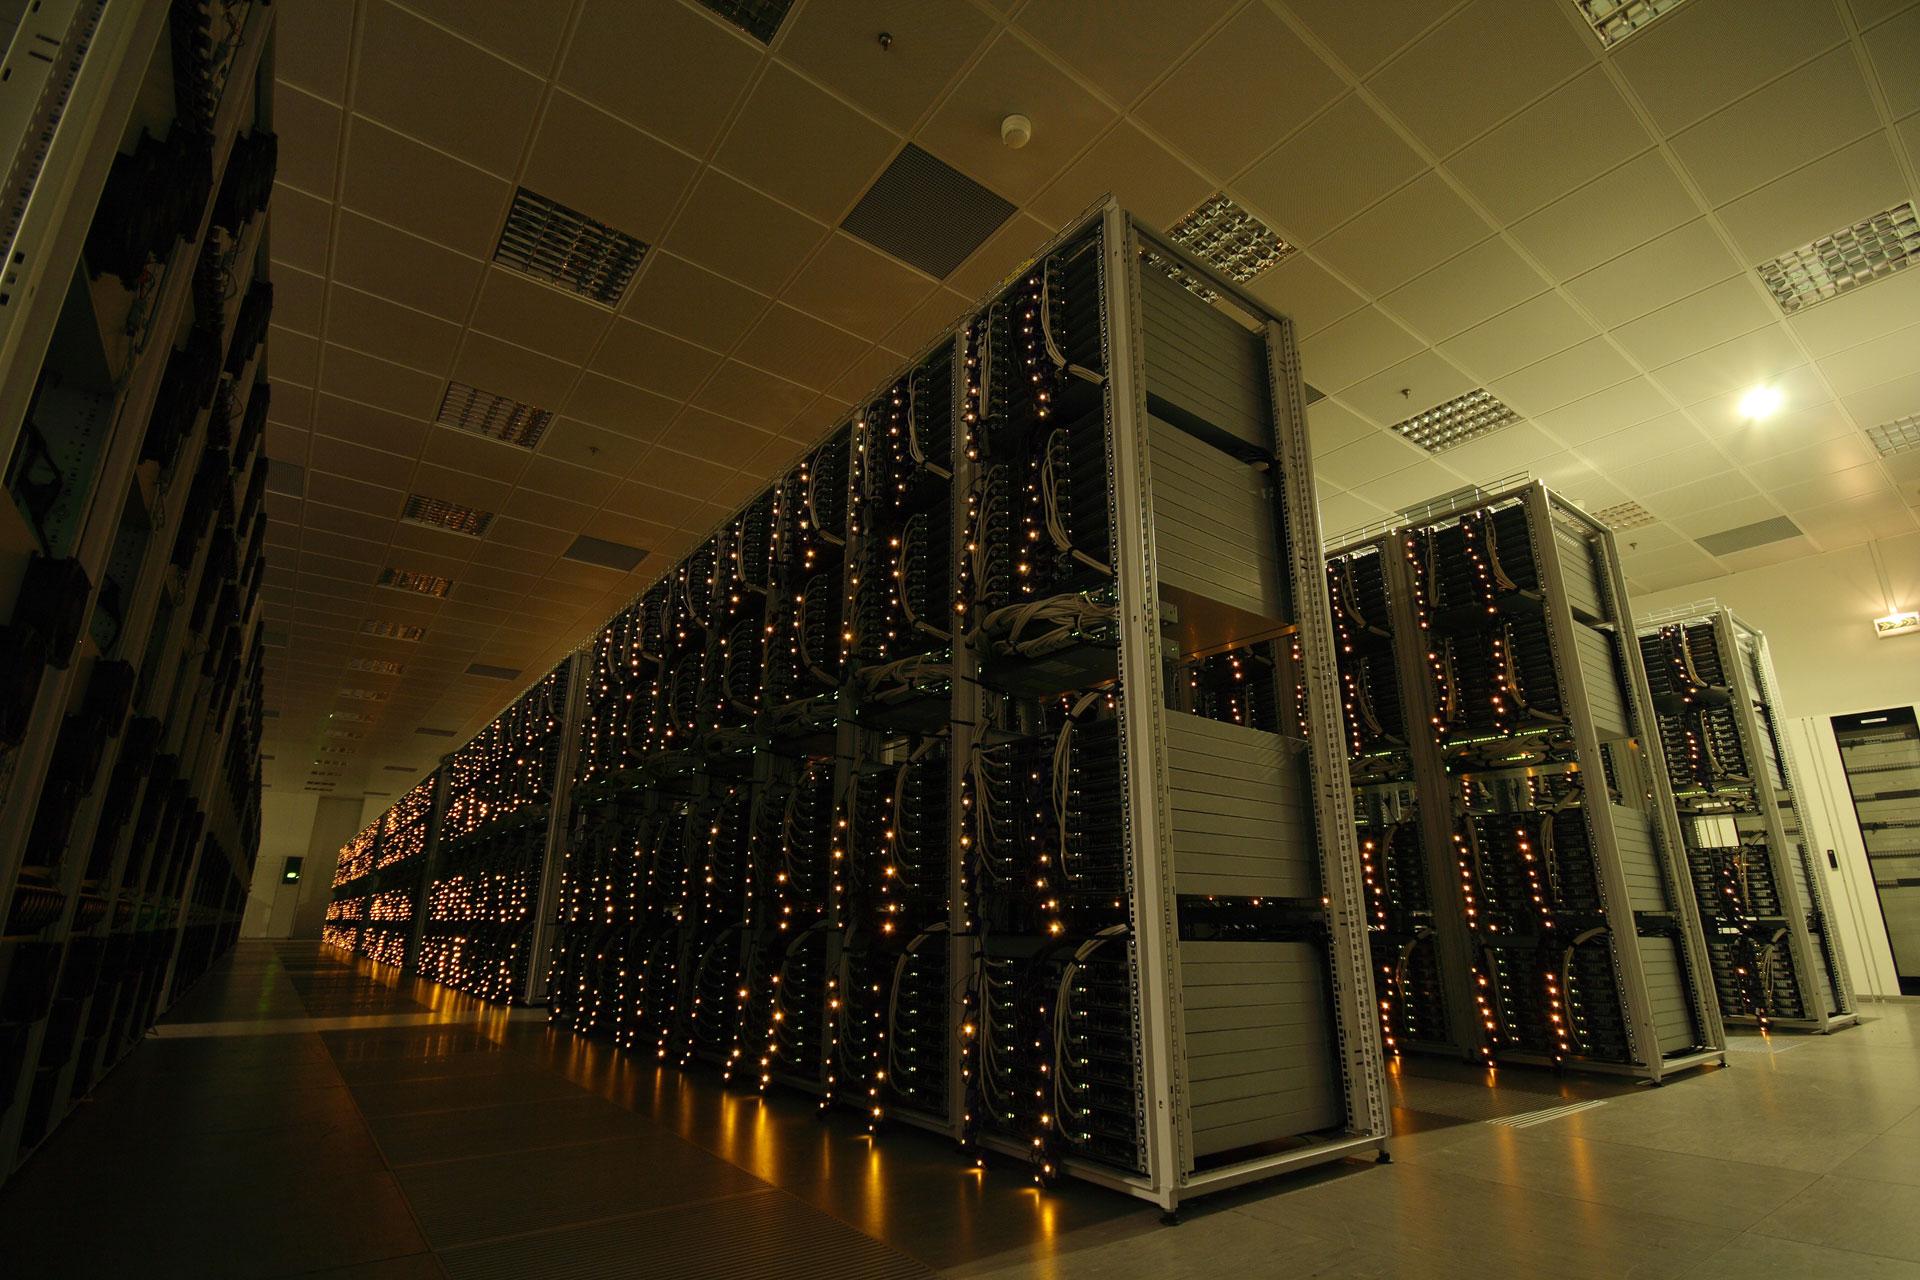 6 dedicated server